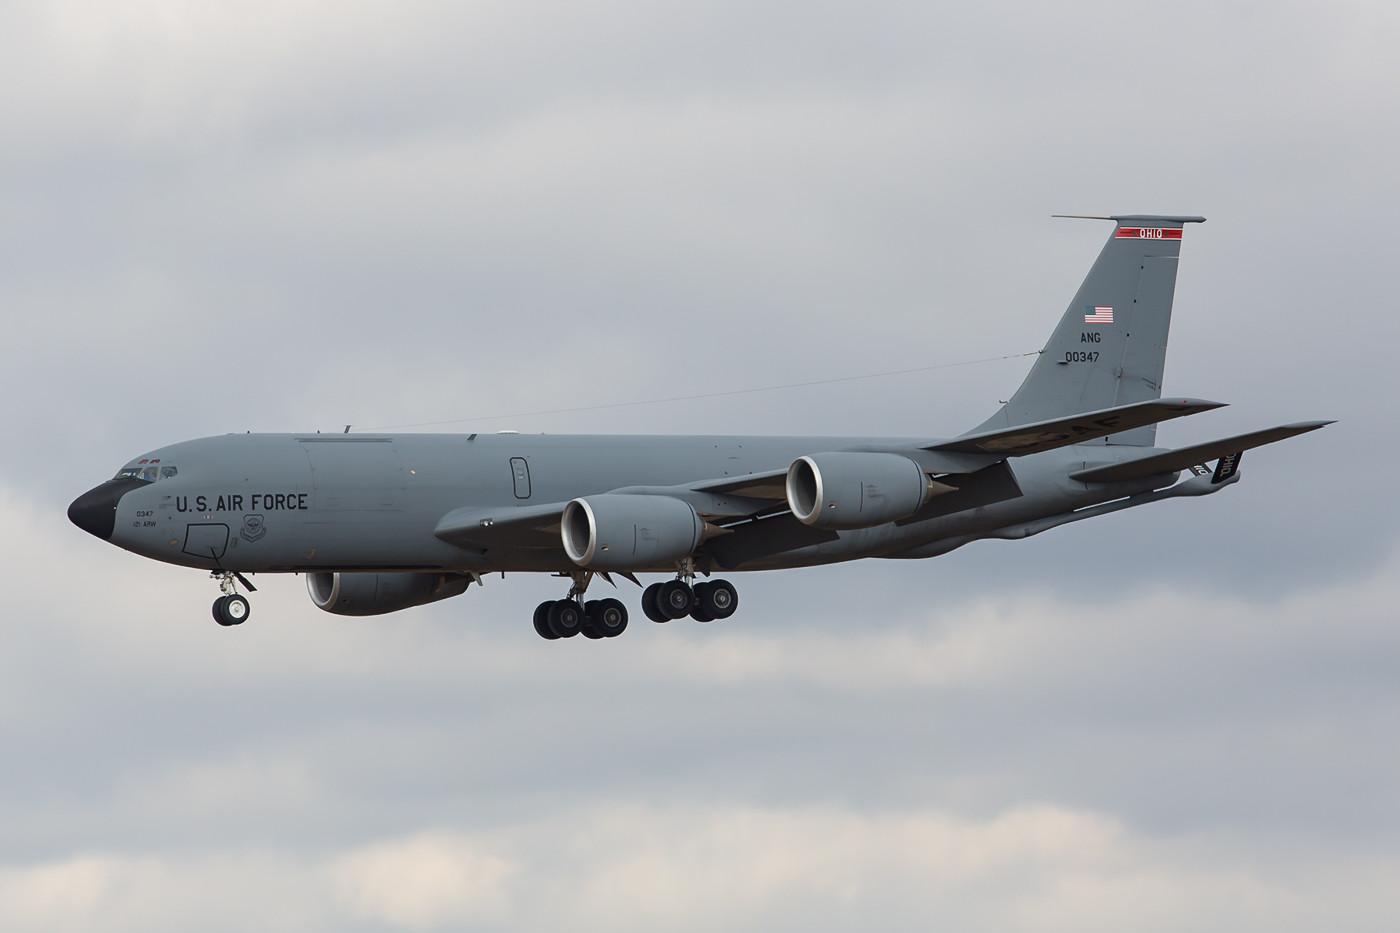 RMS 22.02.2015; KC-135R; 60-0347; 121st ARW Ohio ANG, Rickenbacker AFB